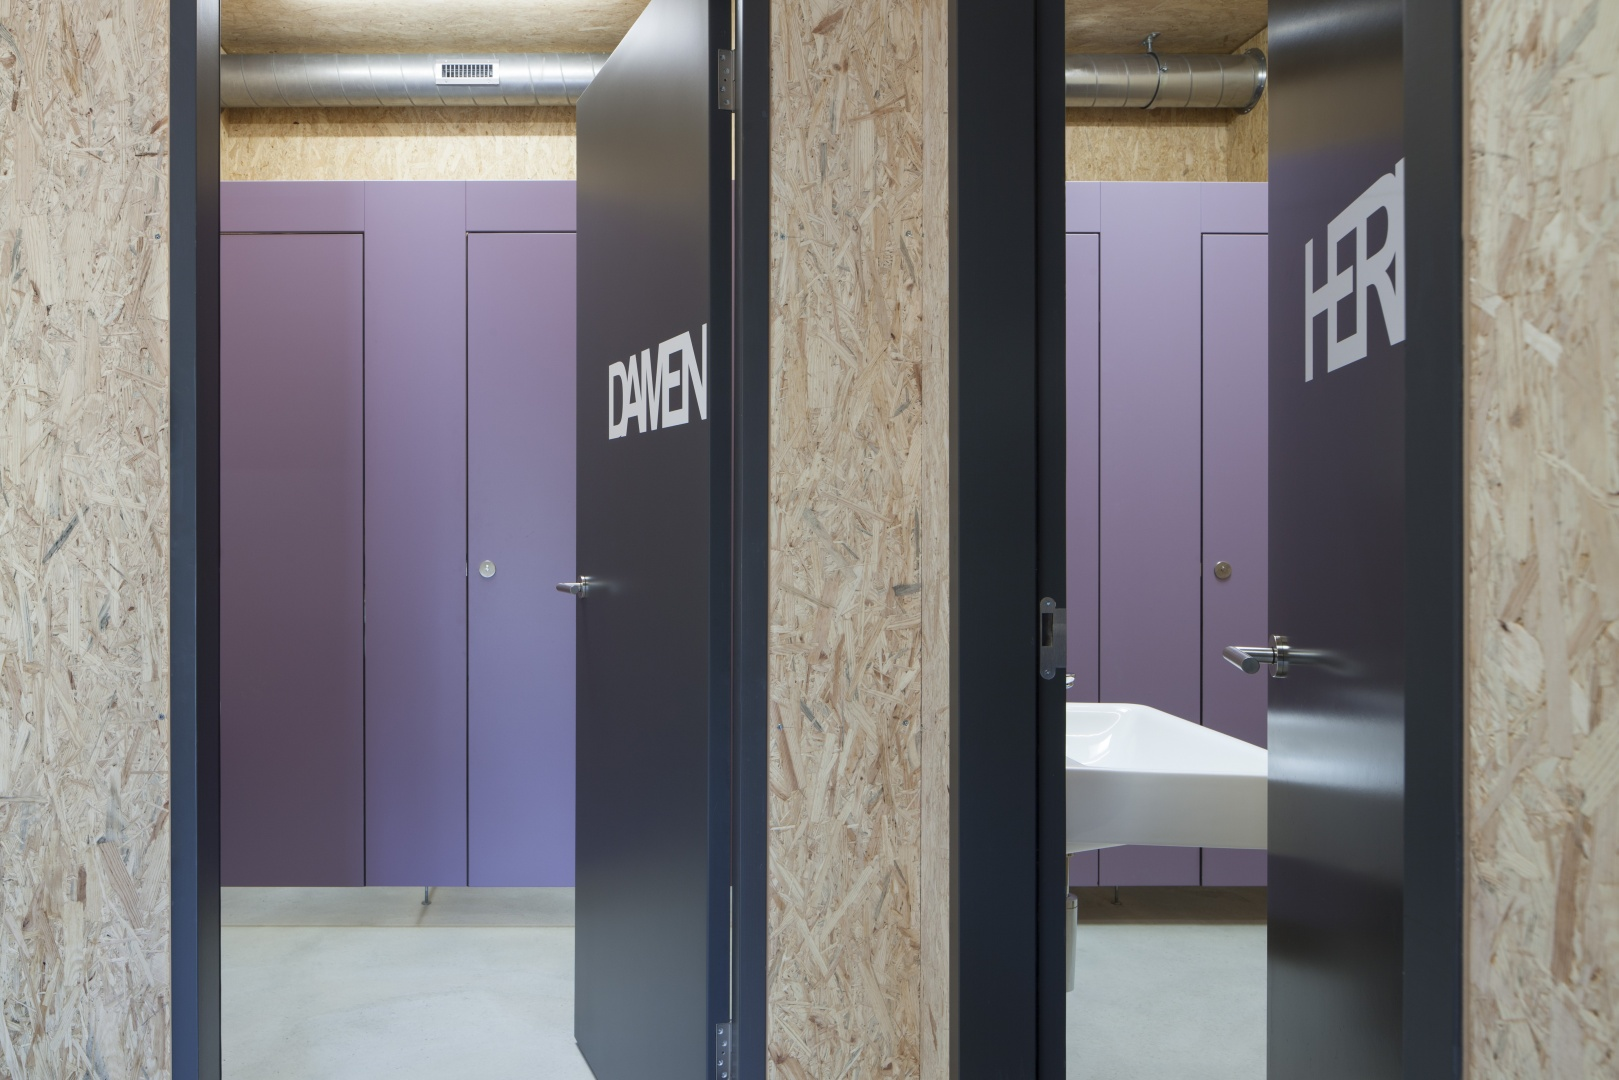 WC-Anlagen © Børje Müller